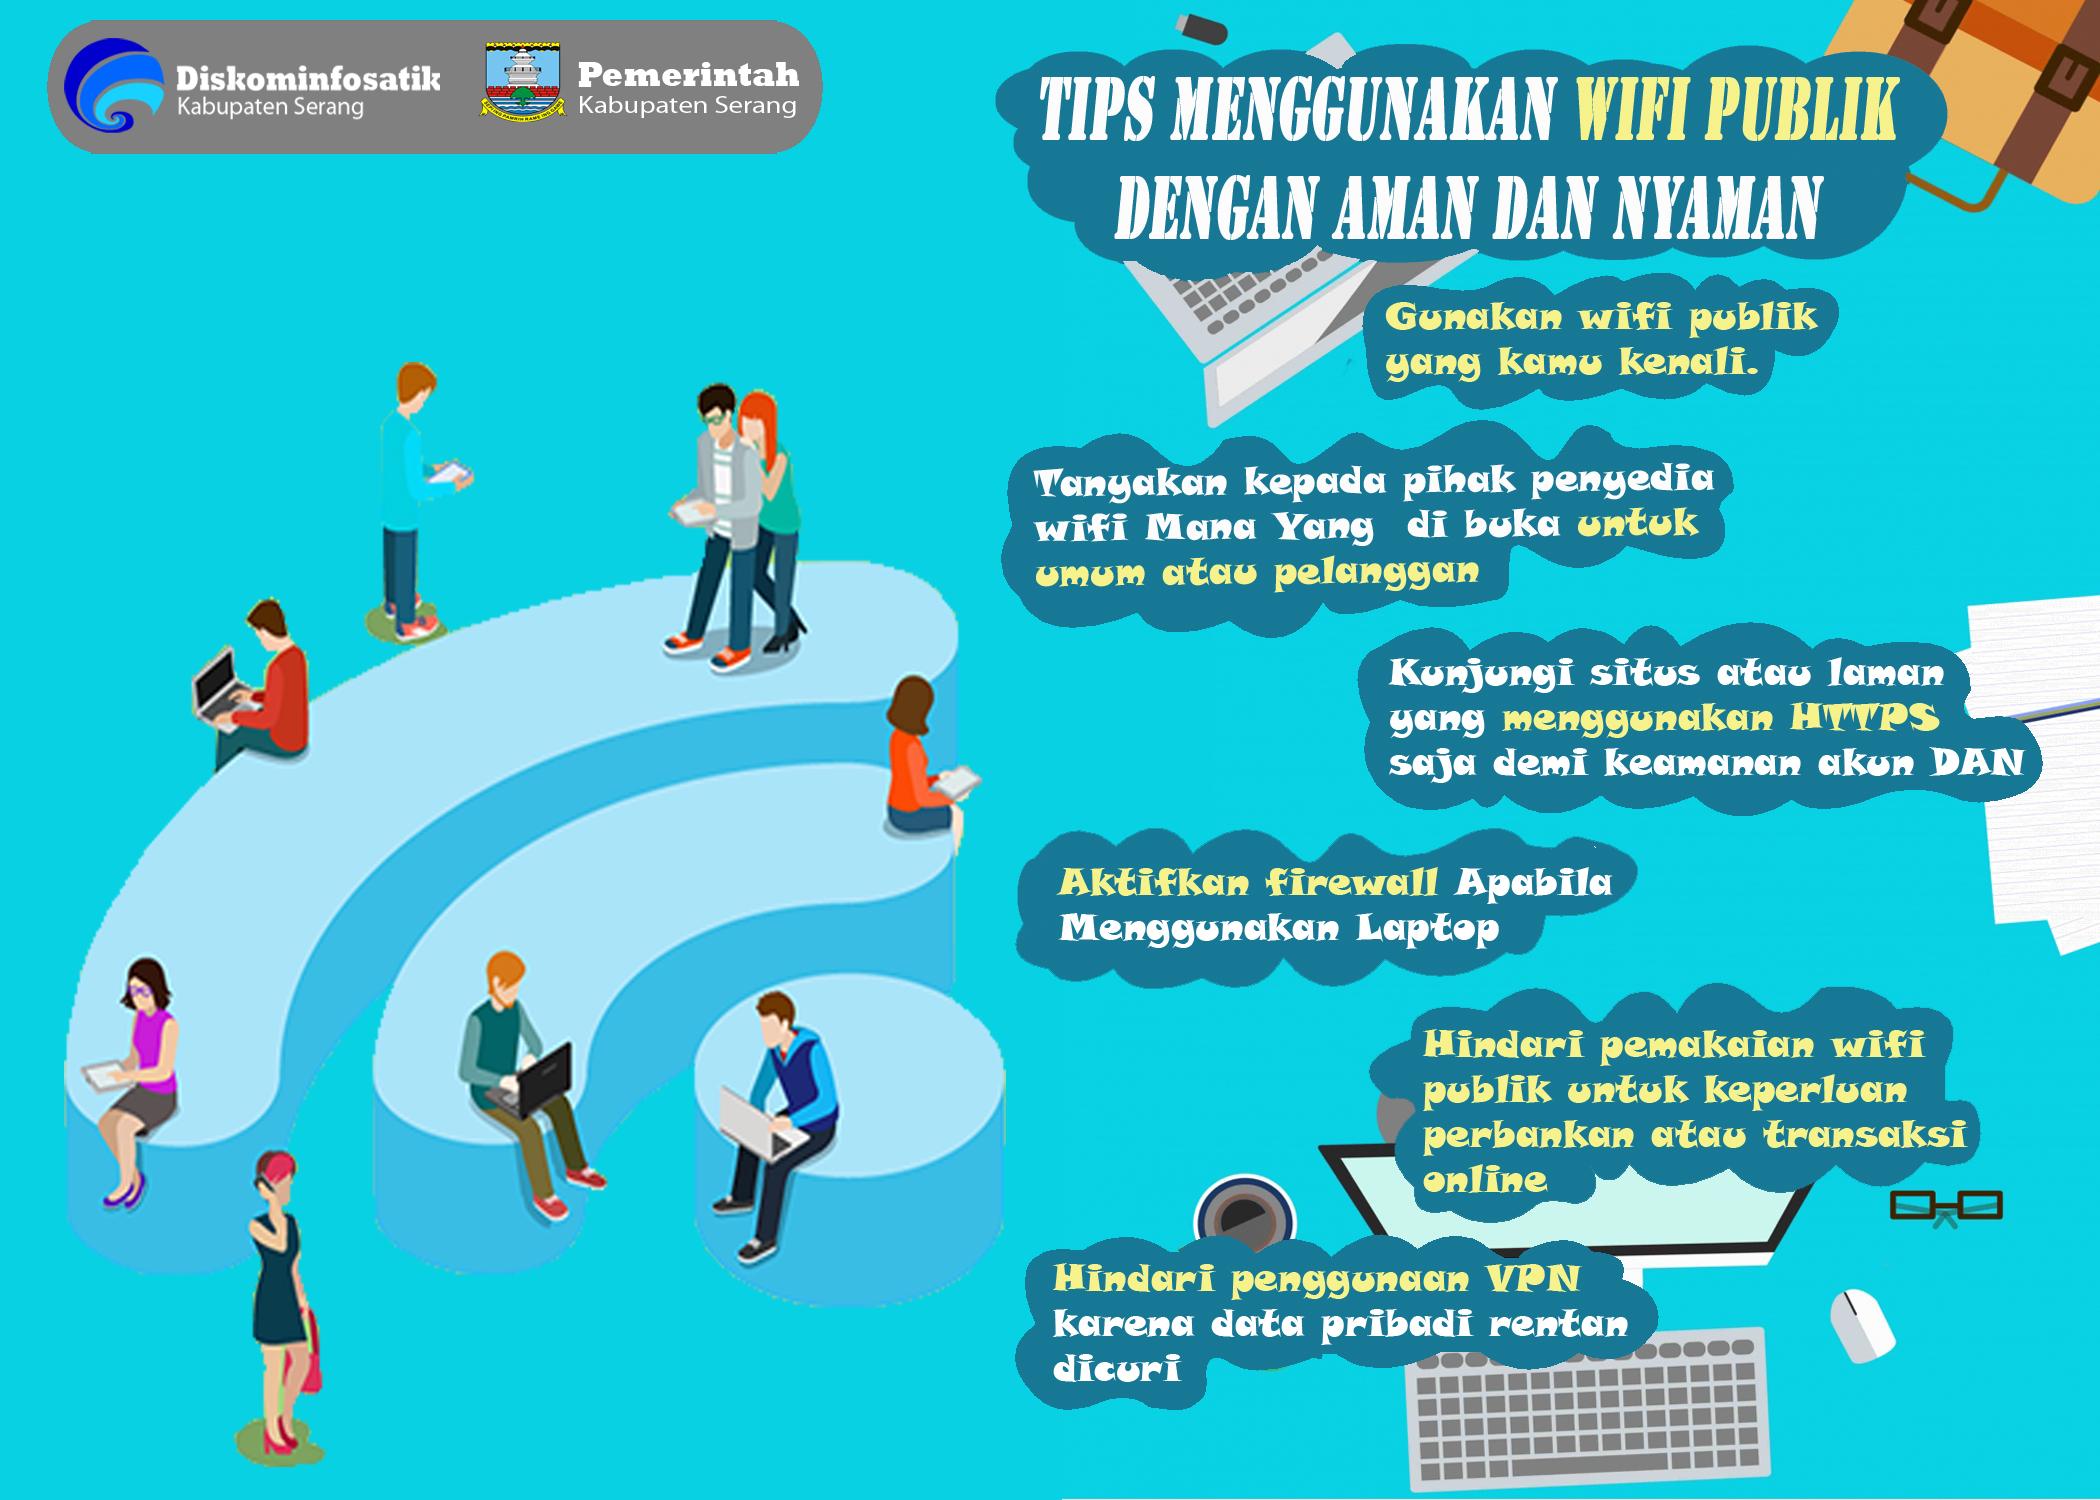 tips-menggunankan-wifi-publik-dengan-aman-dan-nyaman